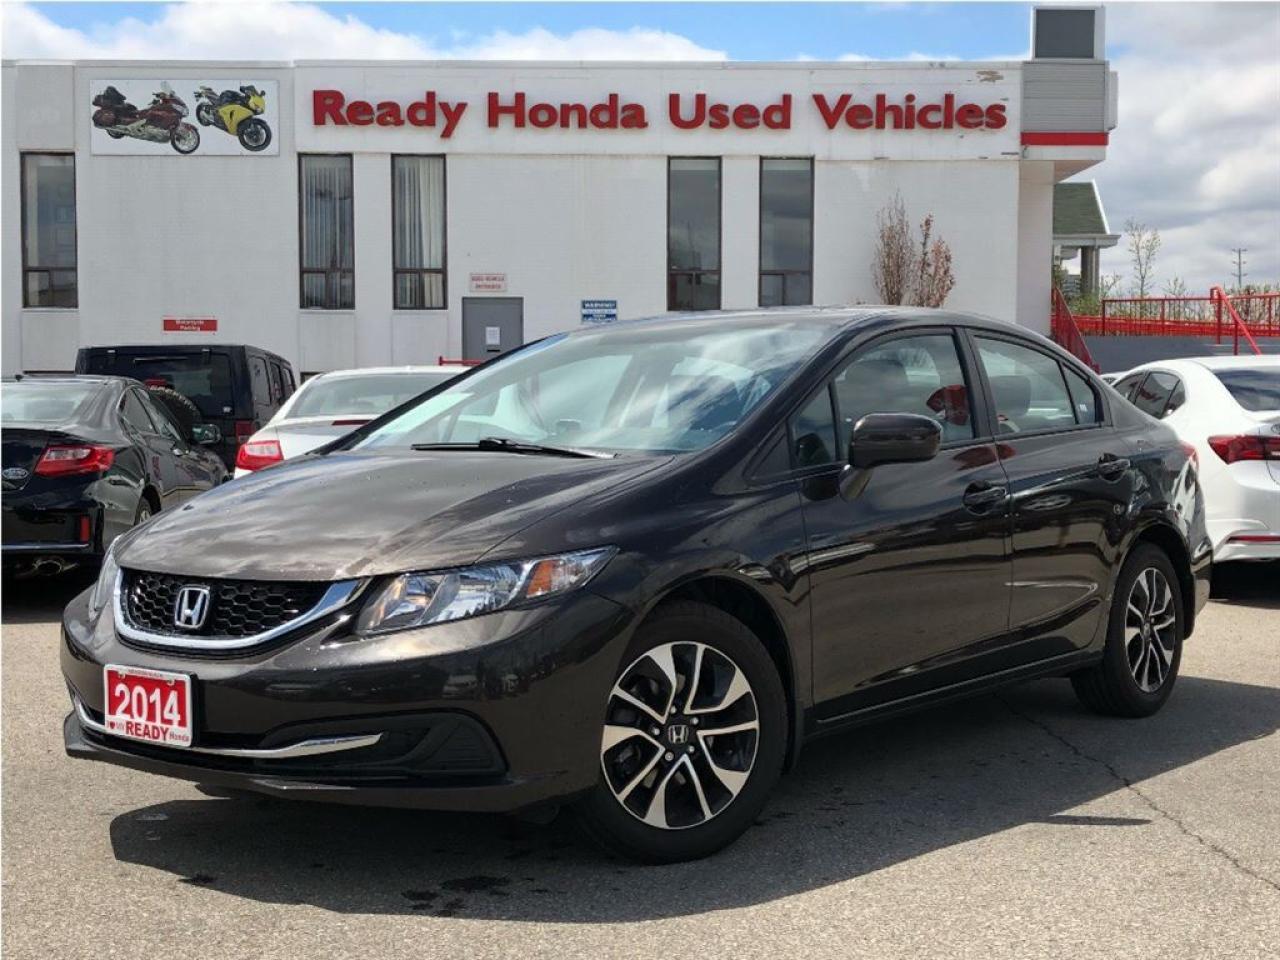 2014 Honda Civic Sedan EX - Sunroof - Alloys - Rear Camera